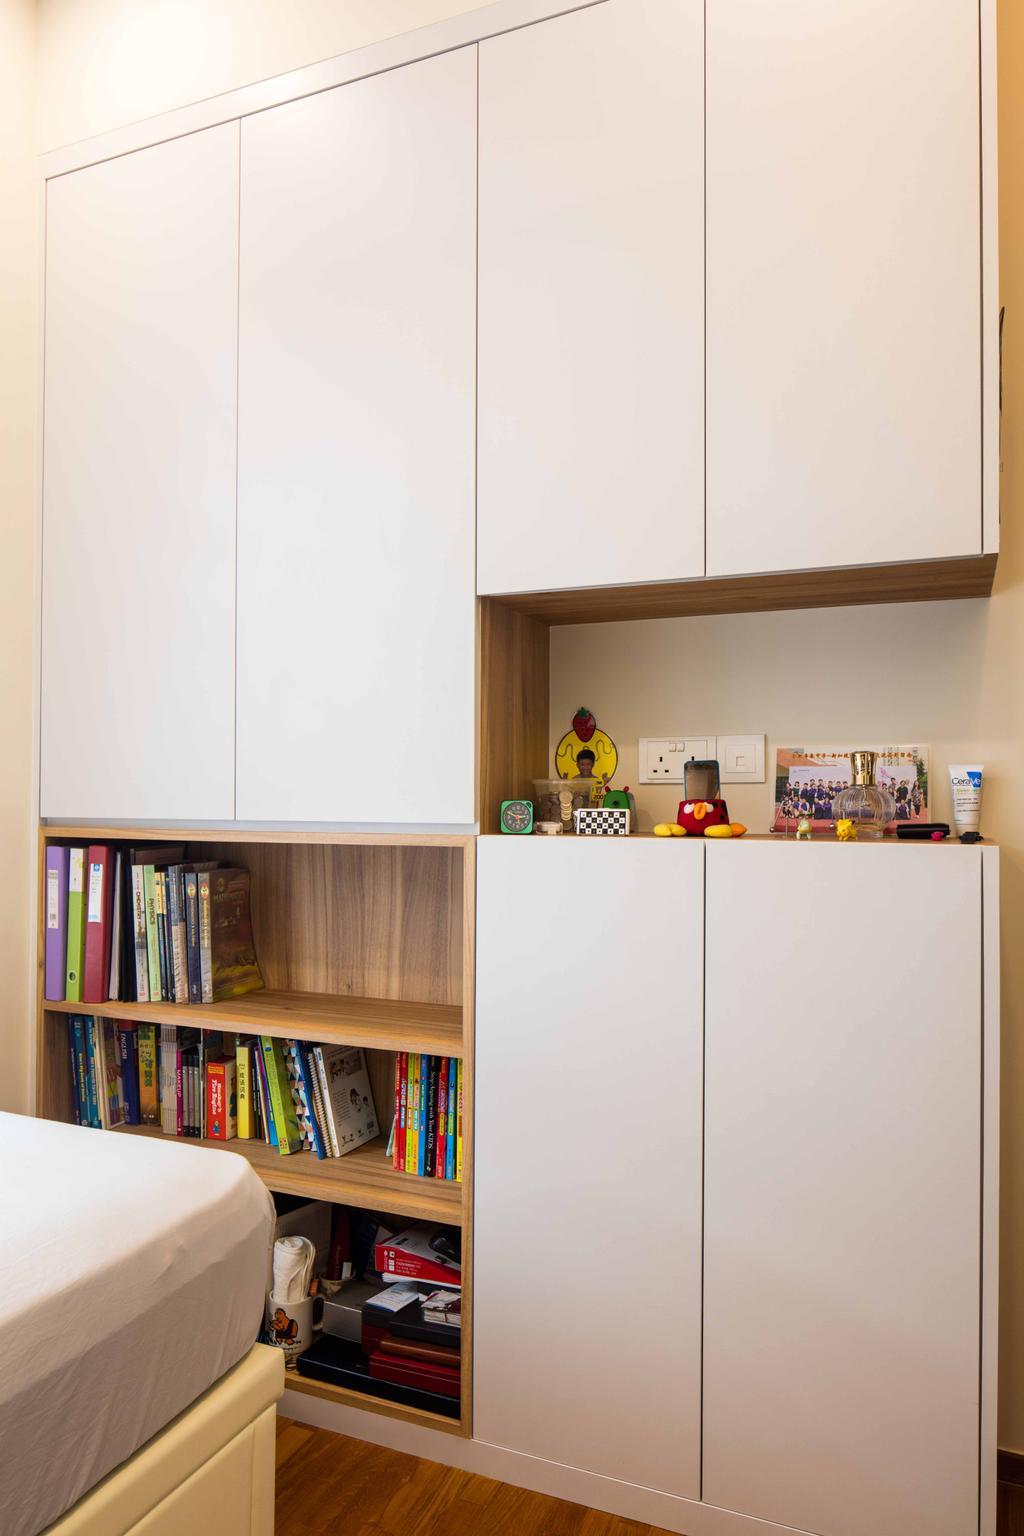 Scandinavian, Condo, Bedroom, Foresque Residences, Interior Designer, Schemacraft, Shelving, Book Shelf, Parquet, Cabinets, Bookcase, Furniture, Appliance, Electrical Device, Fridge, Refrigerator, Shelf